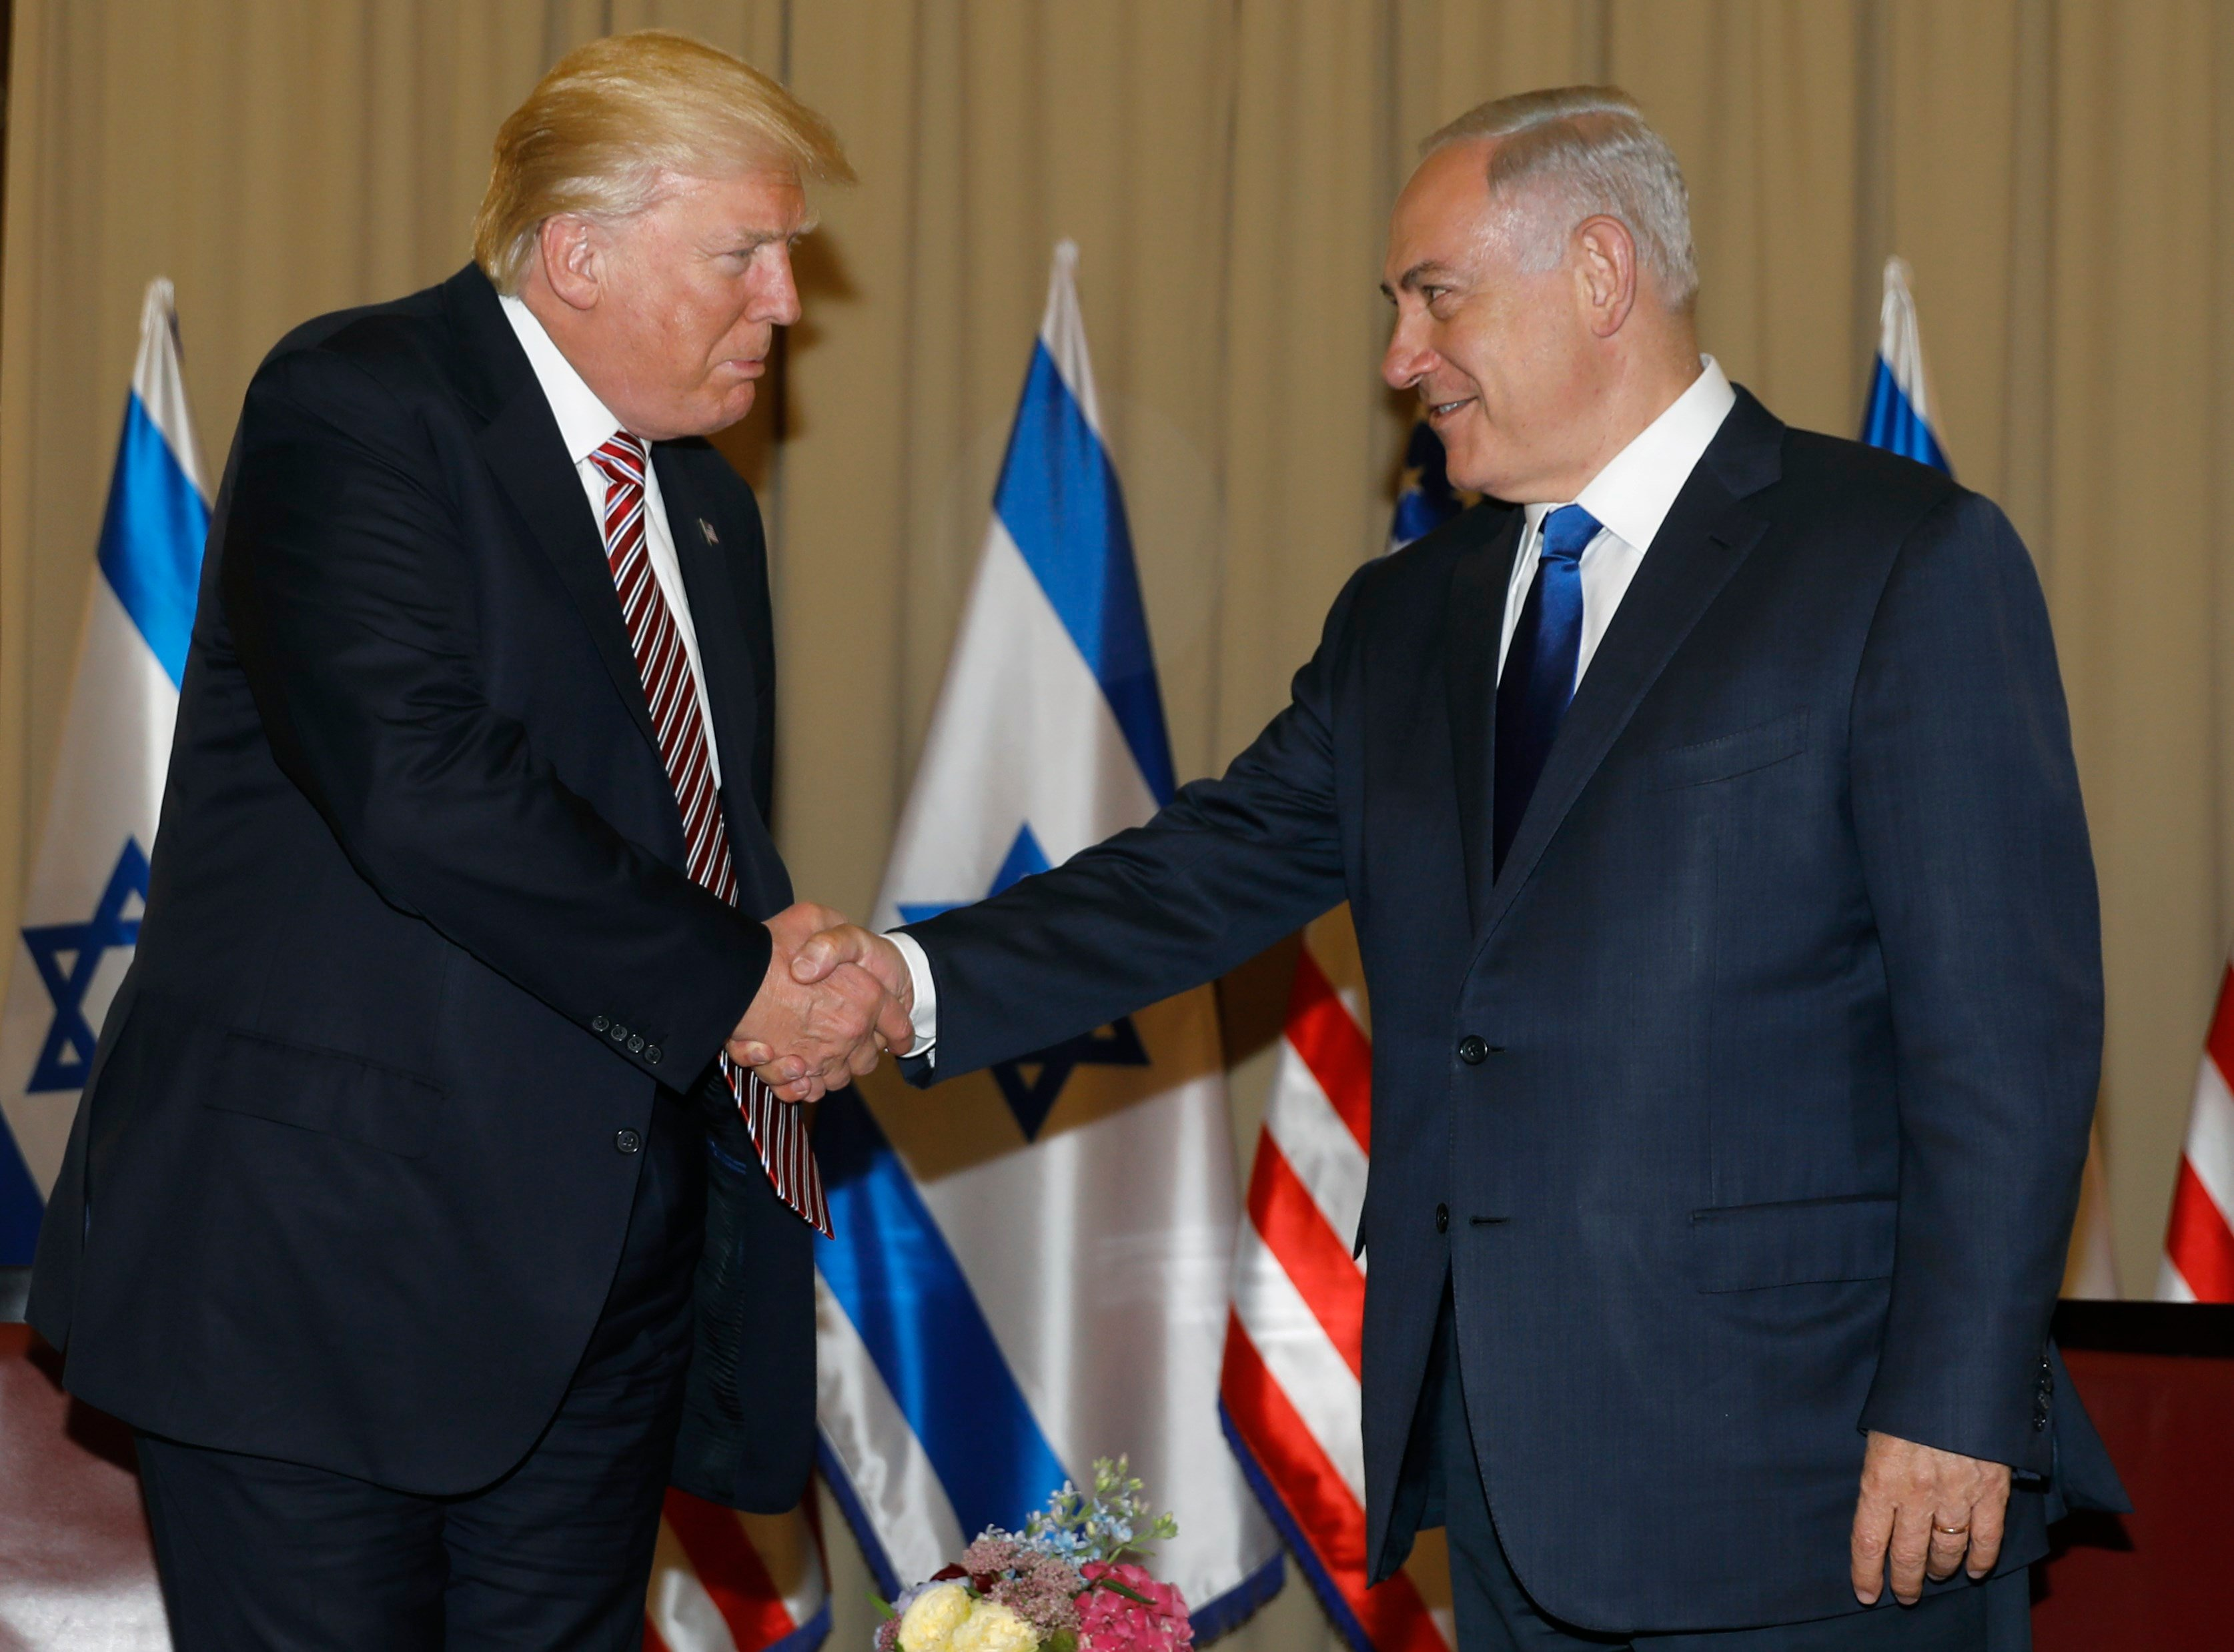 Israel's Prime Minister Benjamin Netanyahu, right and US President Donald Trump shake hands during a meeting in Jerusalem on Monday, May 22, 2017. (Menahem Kahana, Pool via AP)